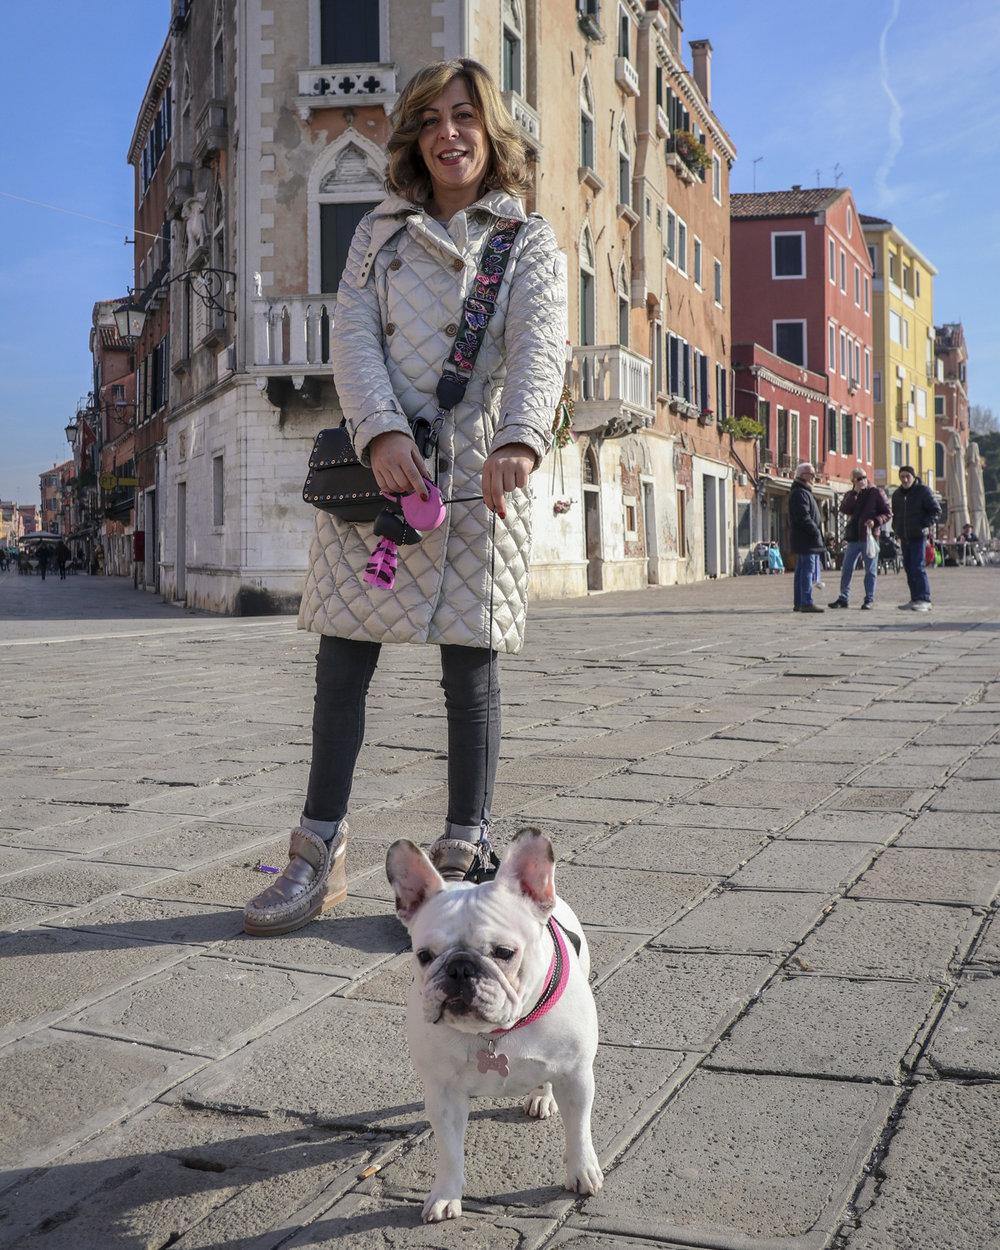 Romena & Chloe